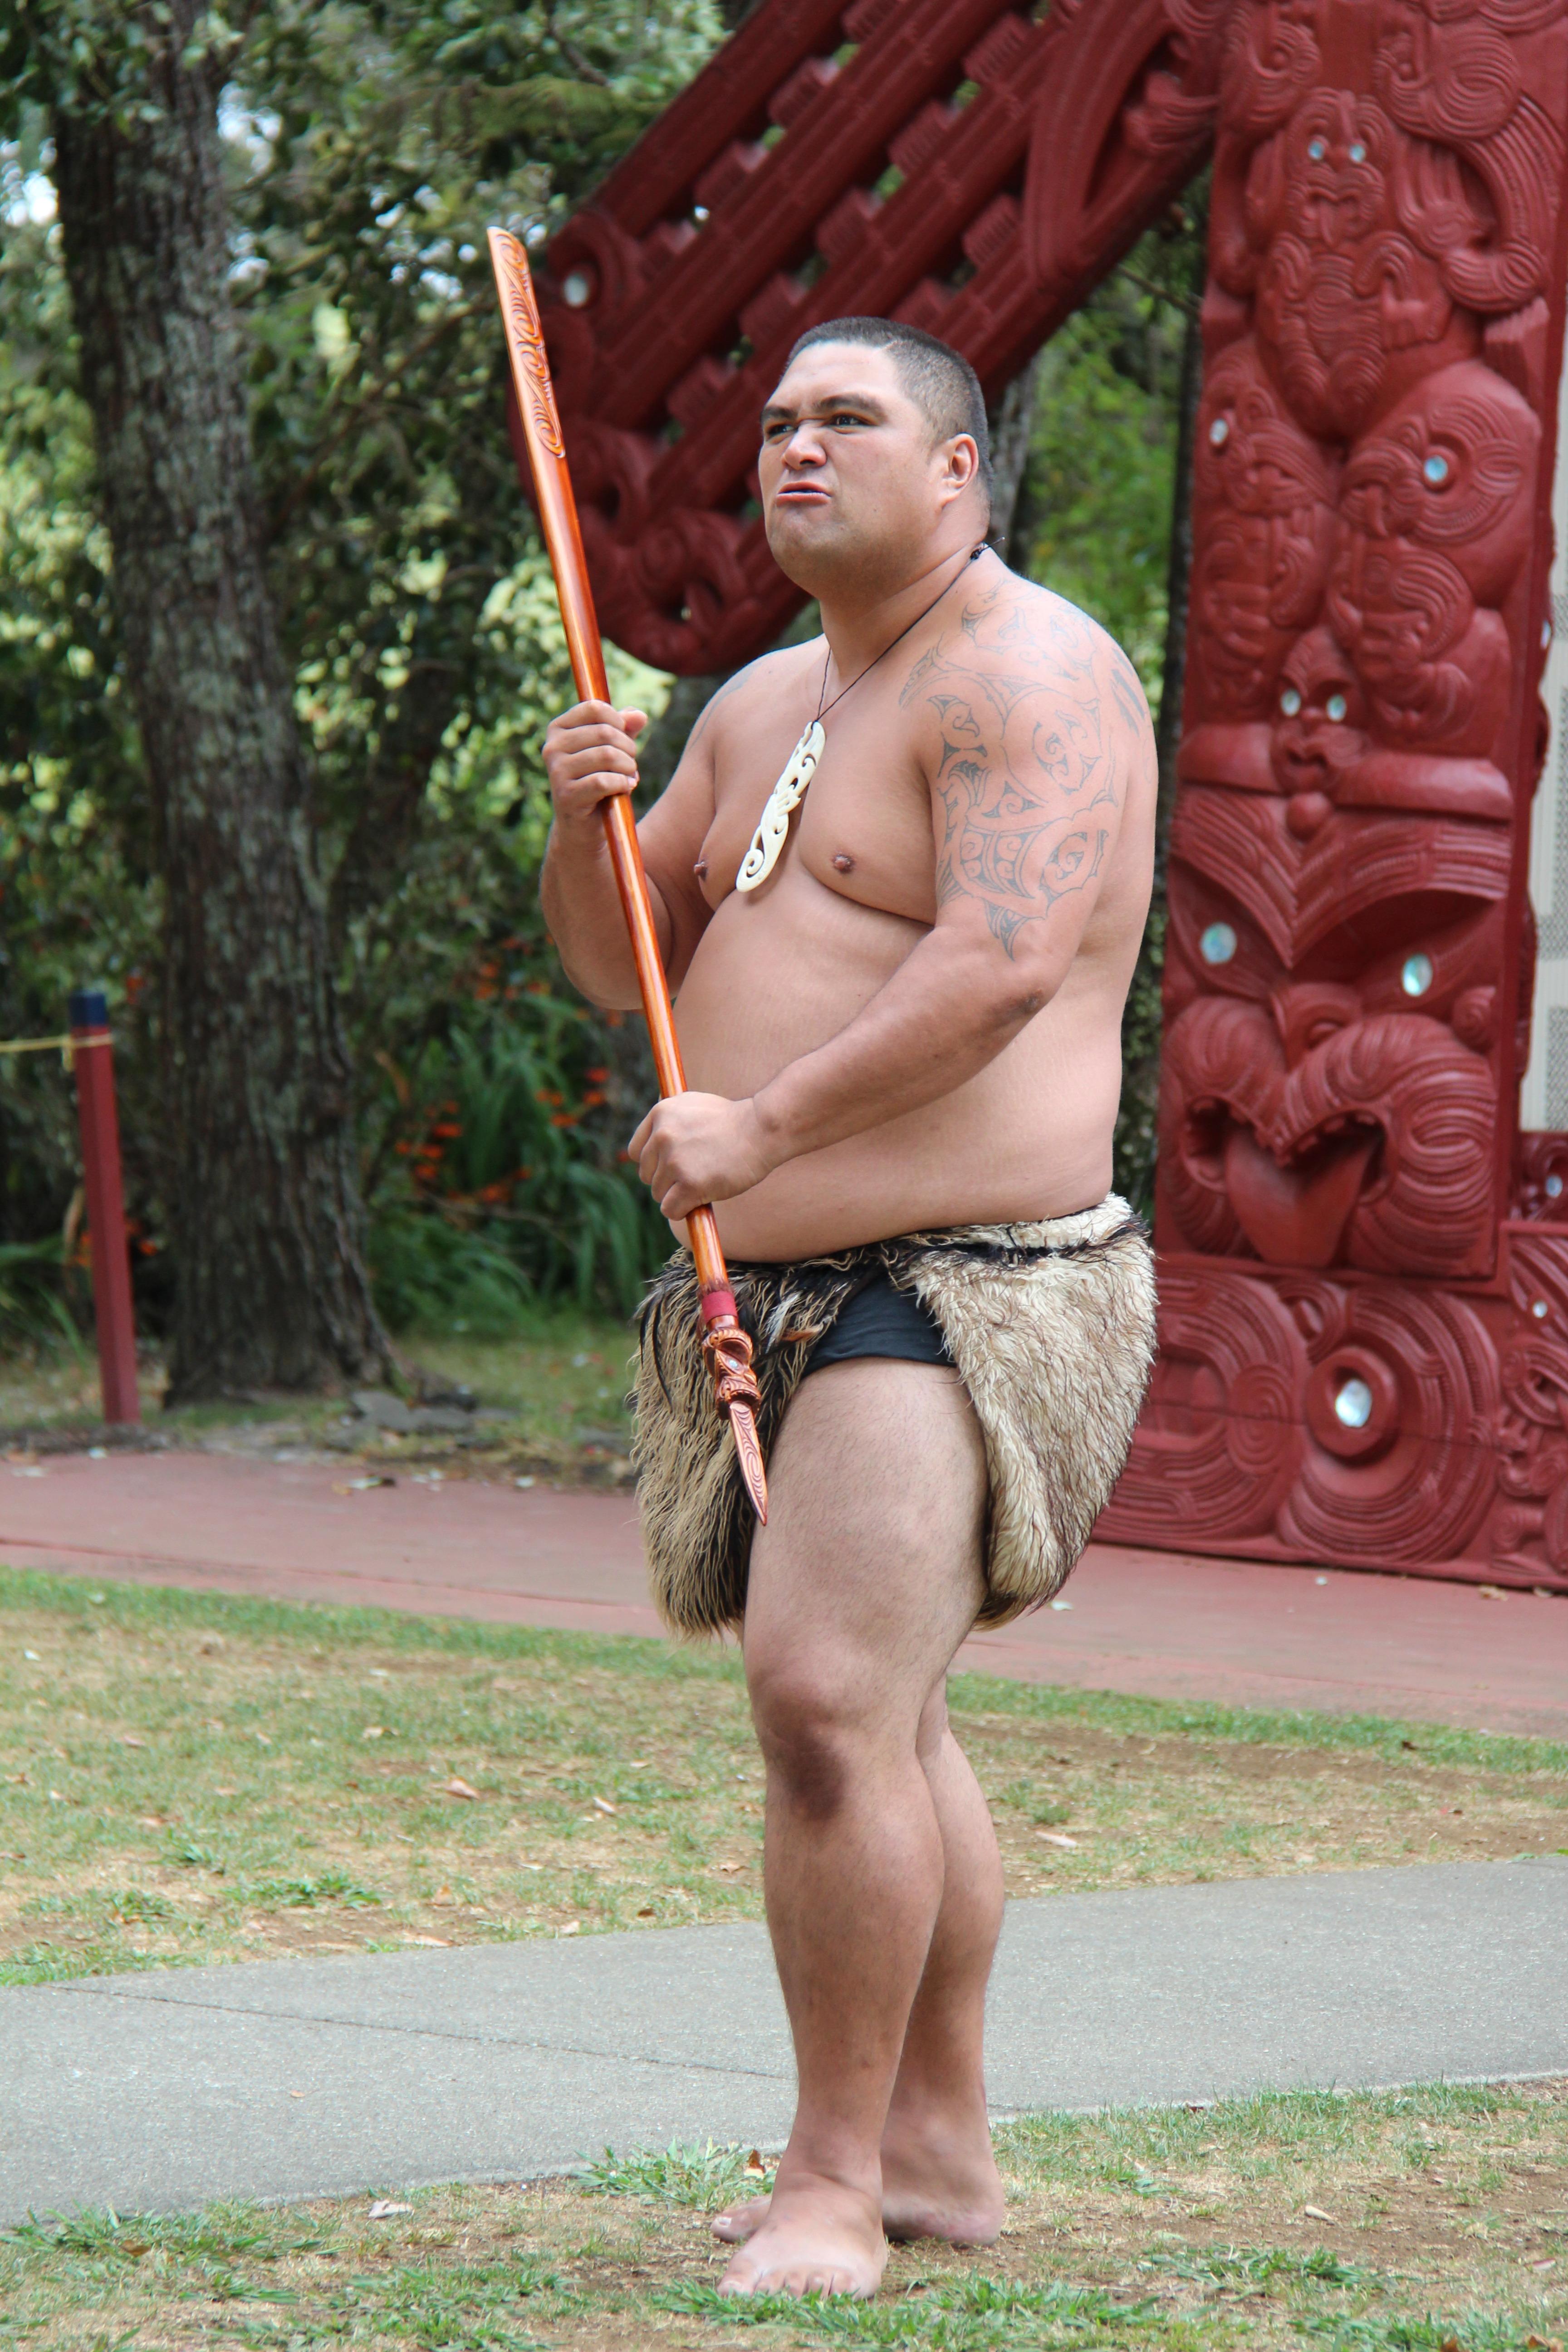 Charming Maori Krieger Ideas Of Kultur, Grimmig, Tradition, Demonstration, Kämpfer, Maori, Krieger,